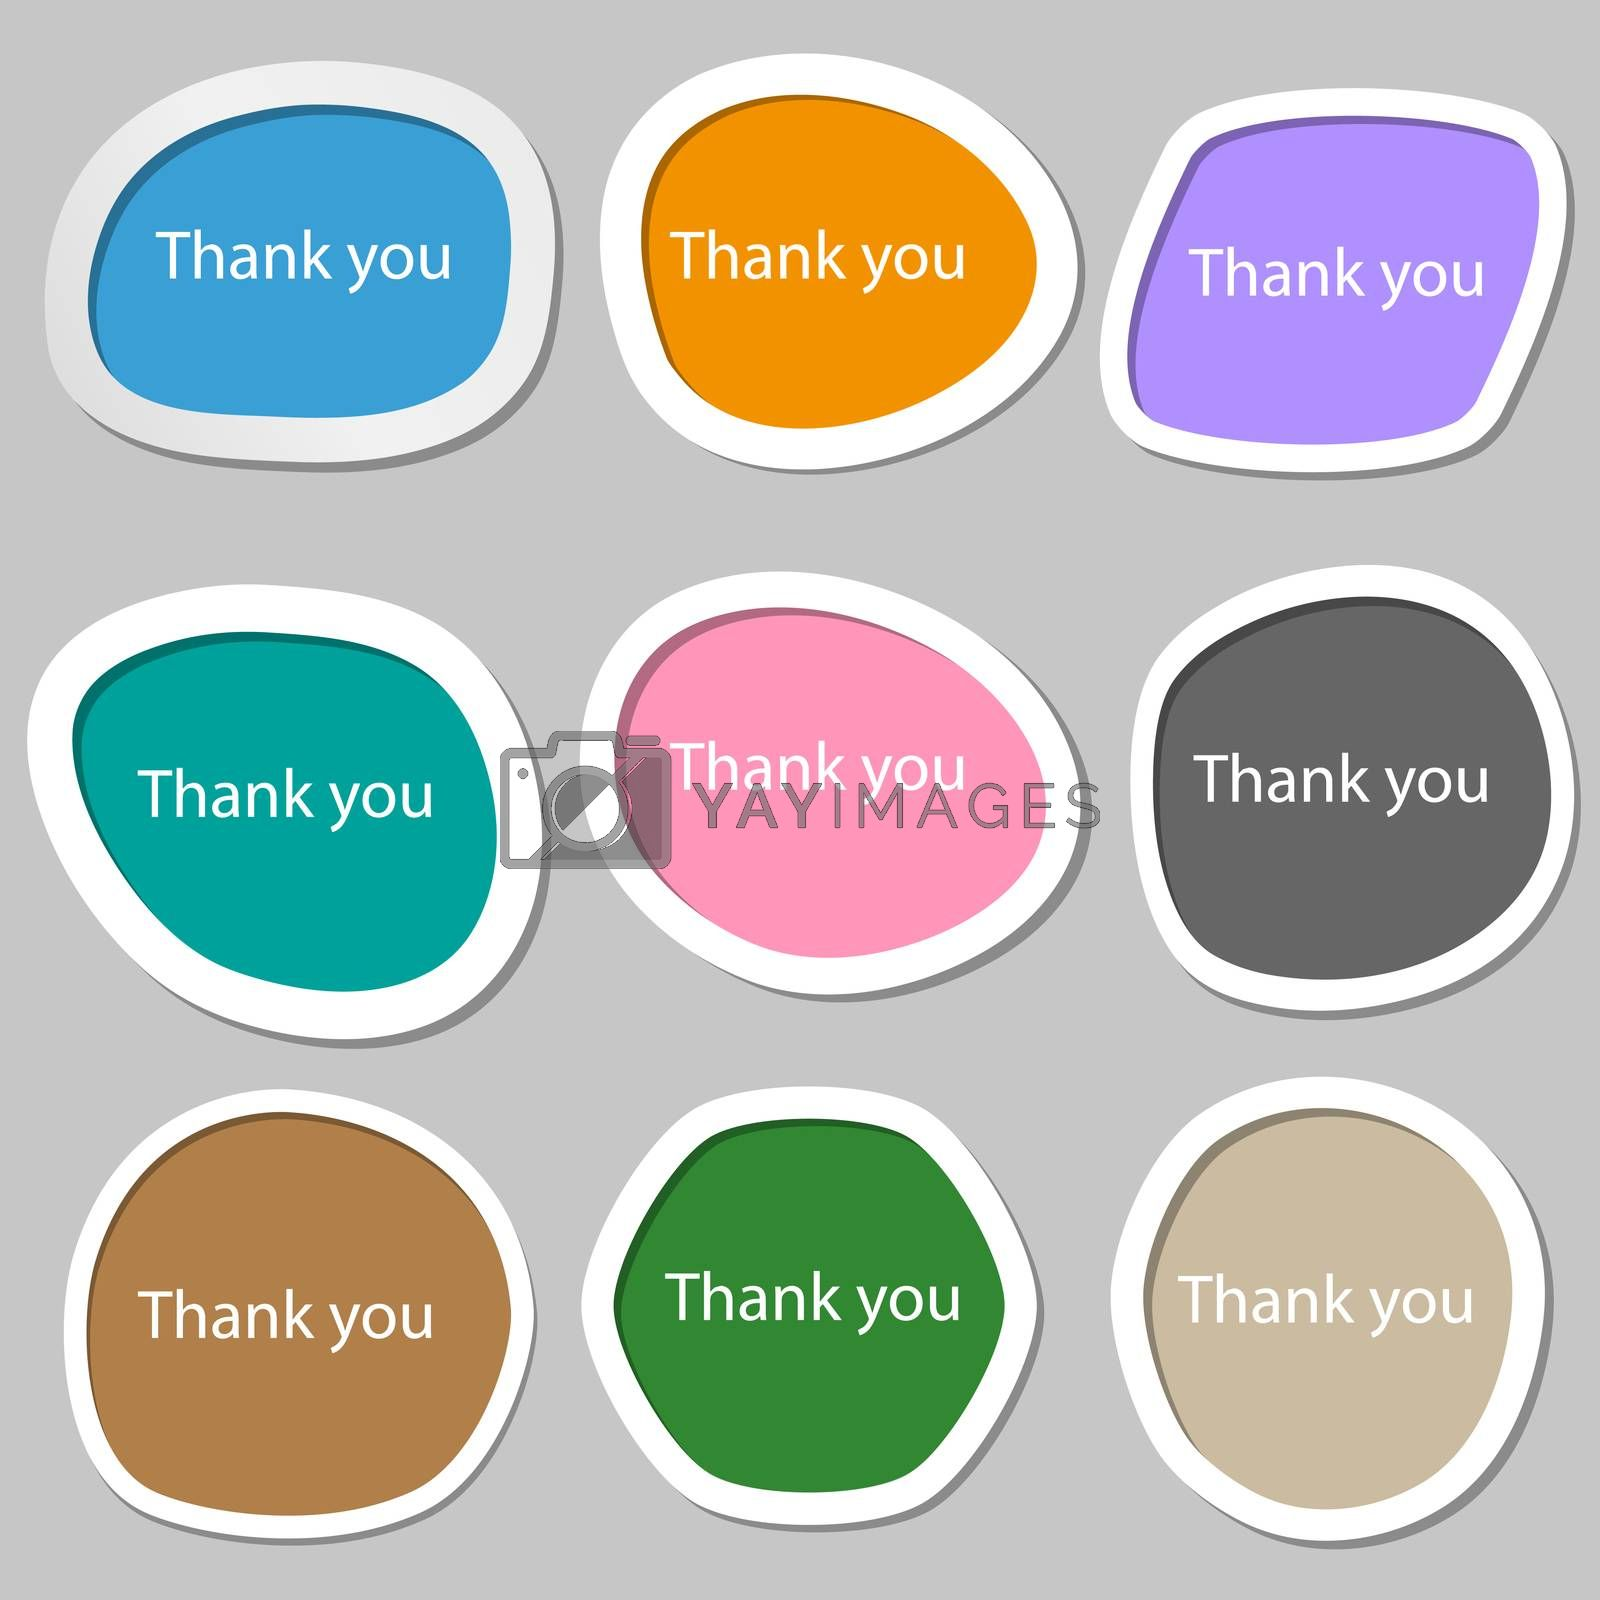 Thank you sign icon. Gratitude symbol. Multicolored paper stickers. illustration